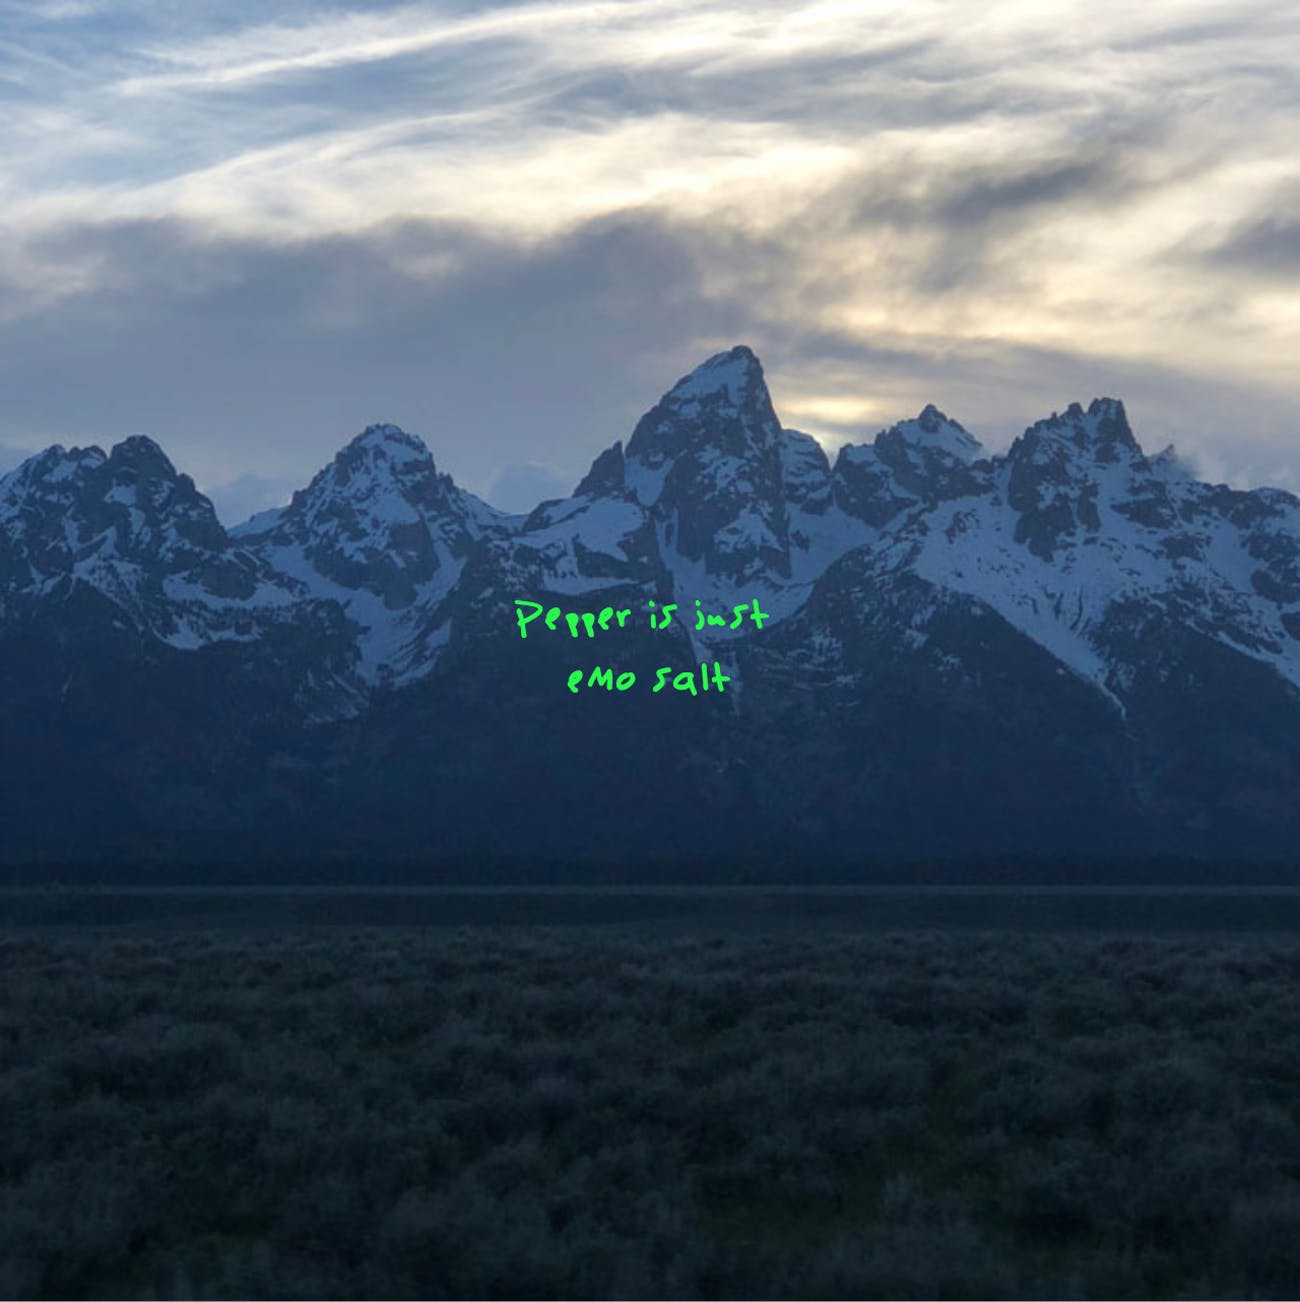 Dennys, Kanye West, Ye, meme